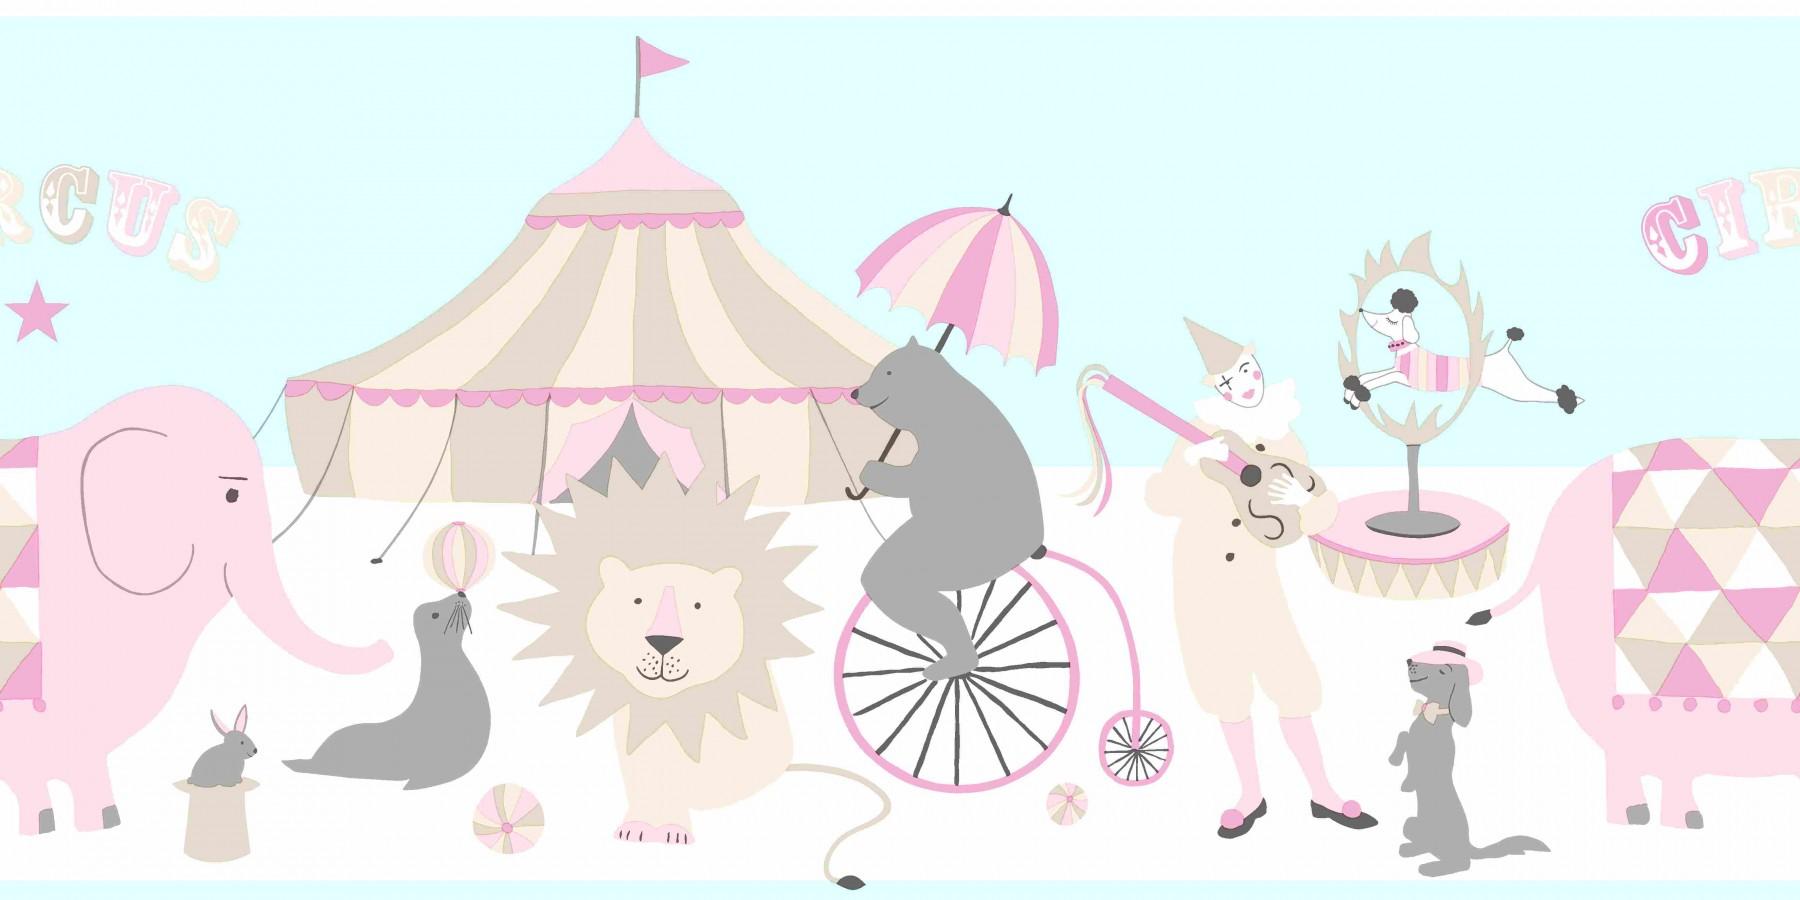 Cenefa para dormitorios infantiles motivos del circo Le Cirque 7364